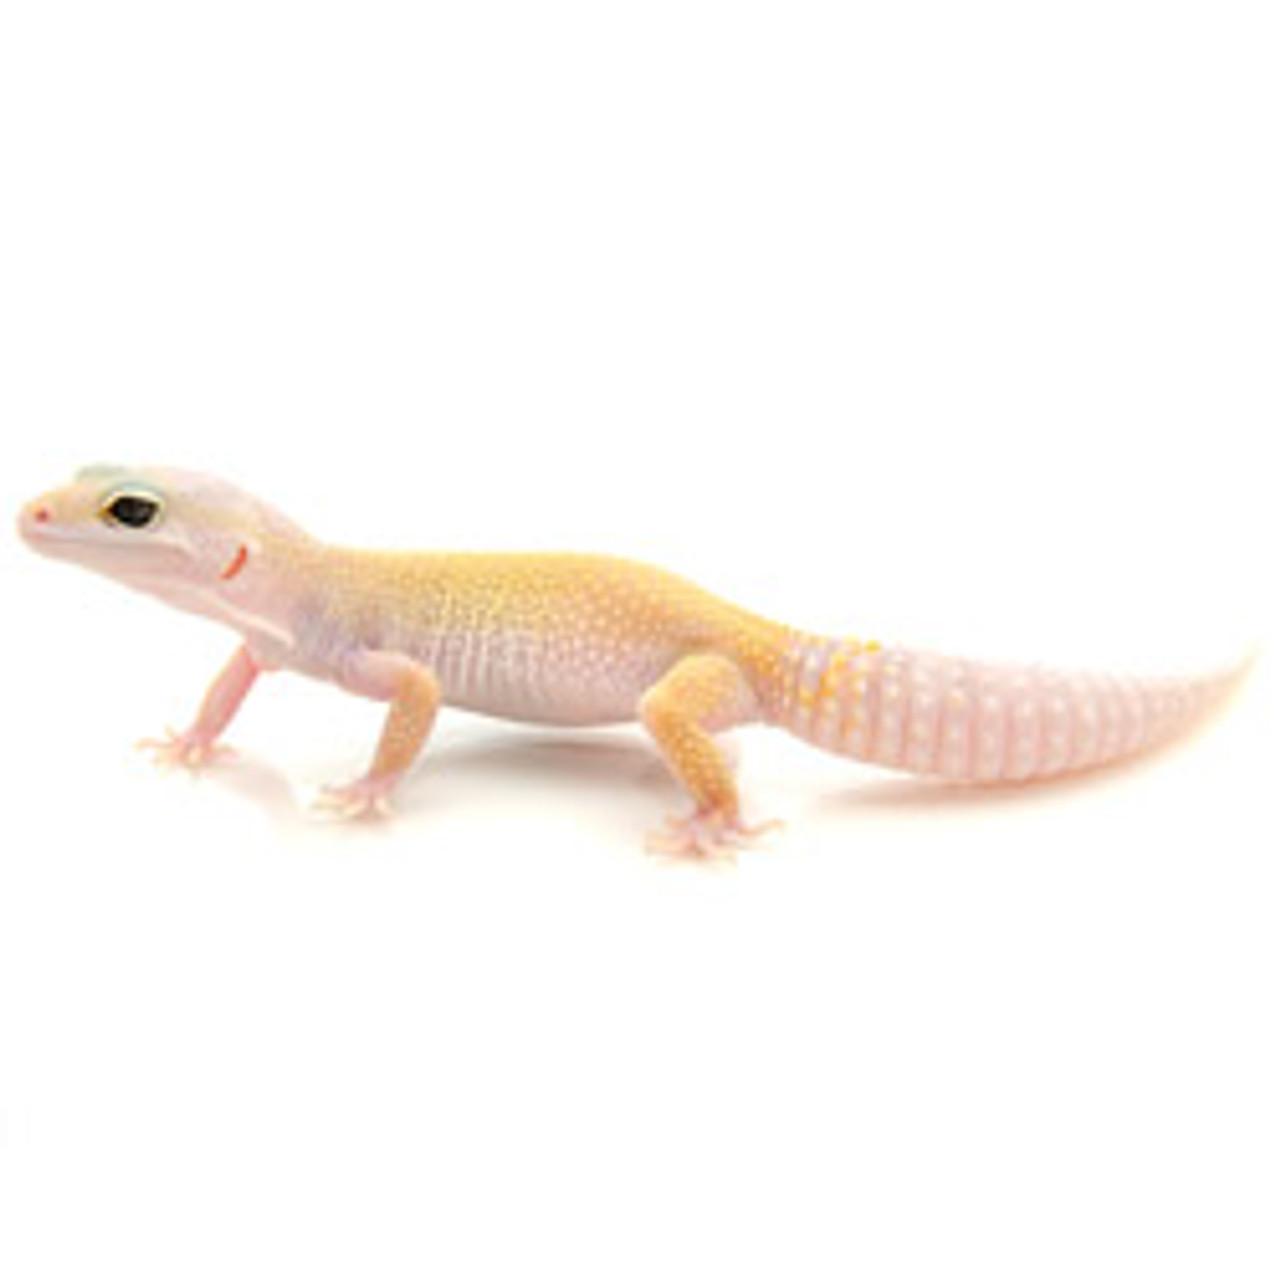 Leucistic Leopard Gecko (Eublepharis macularius) BABY